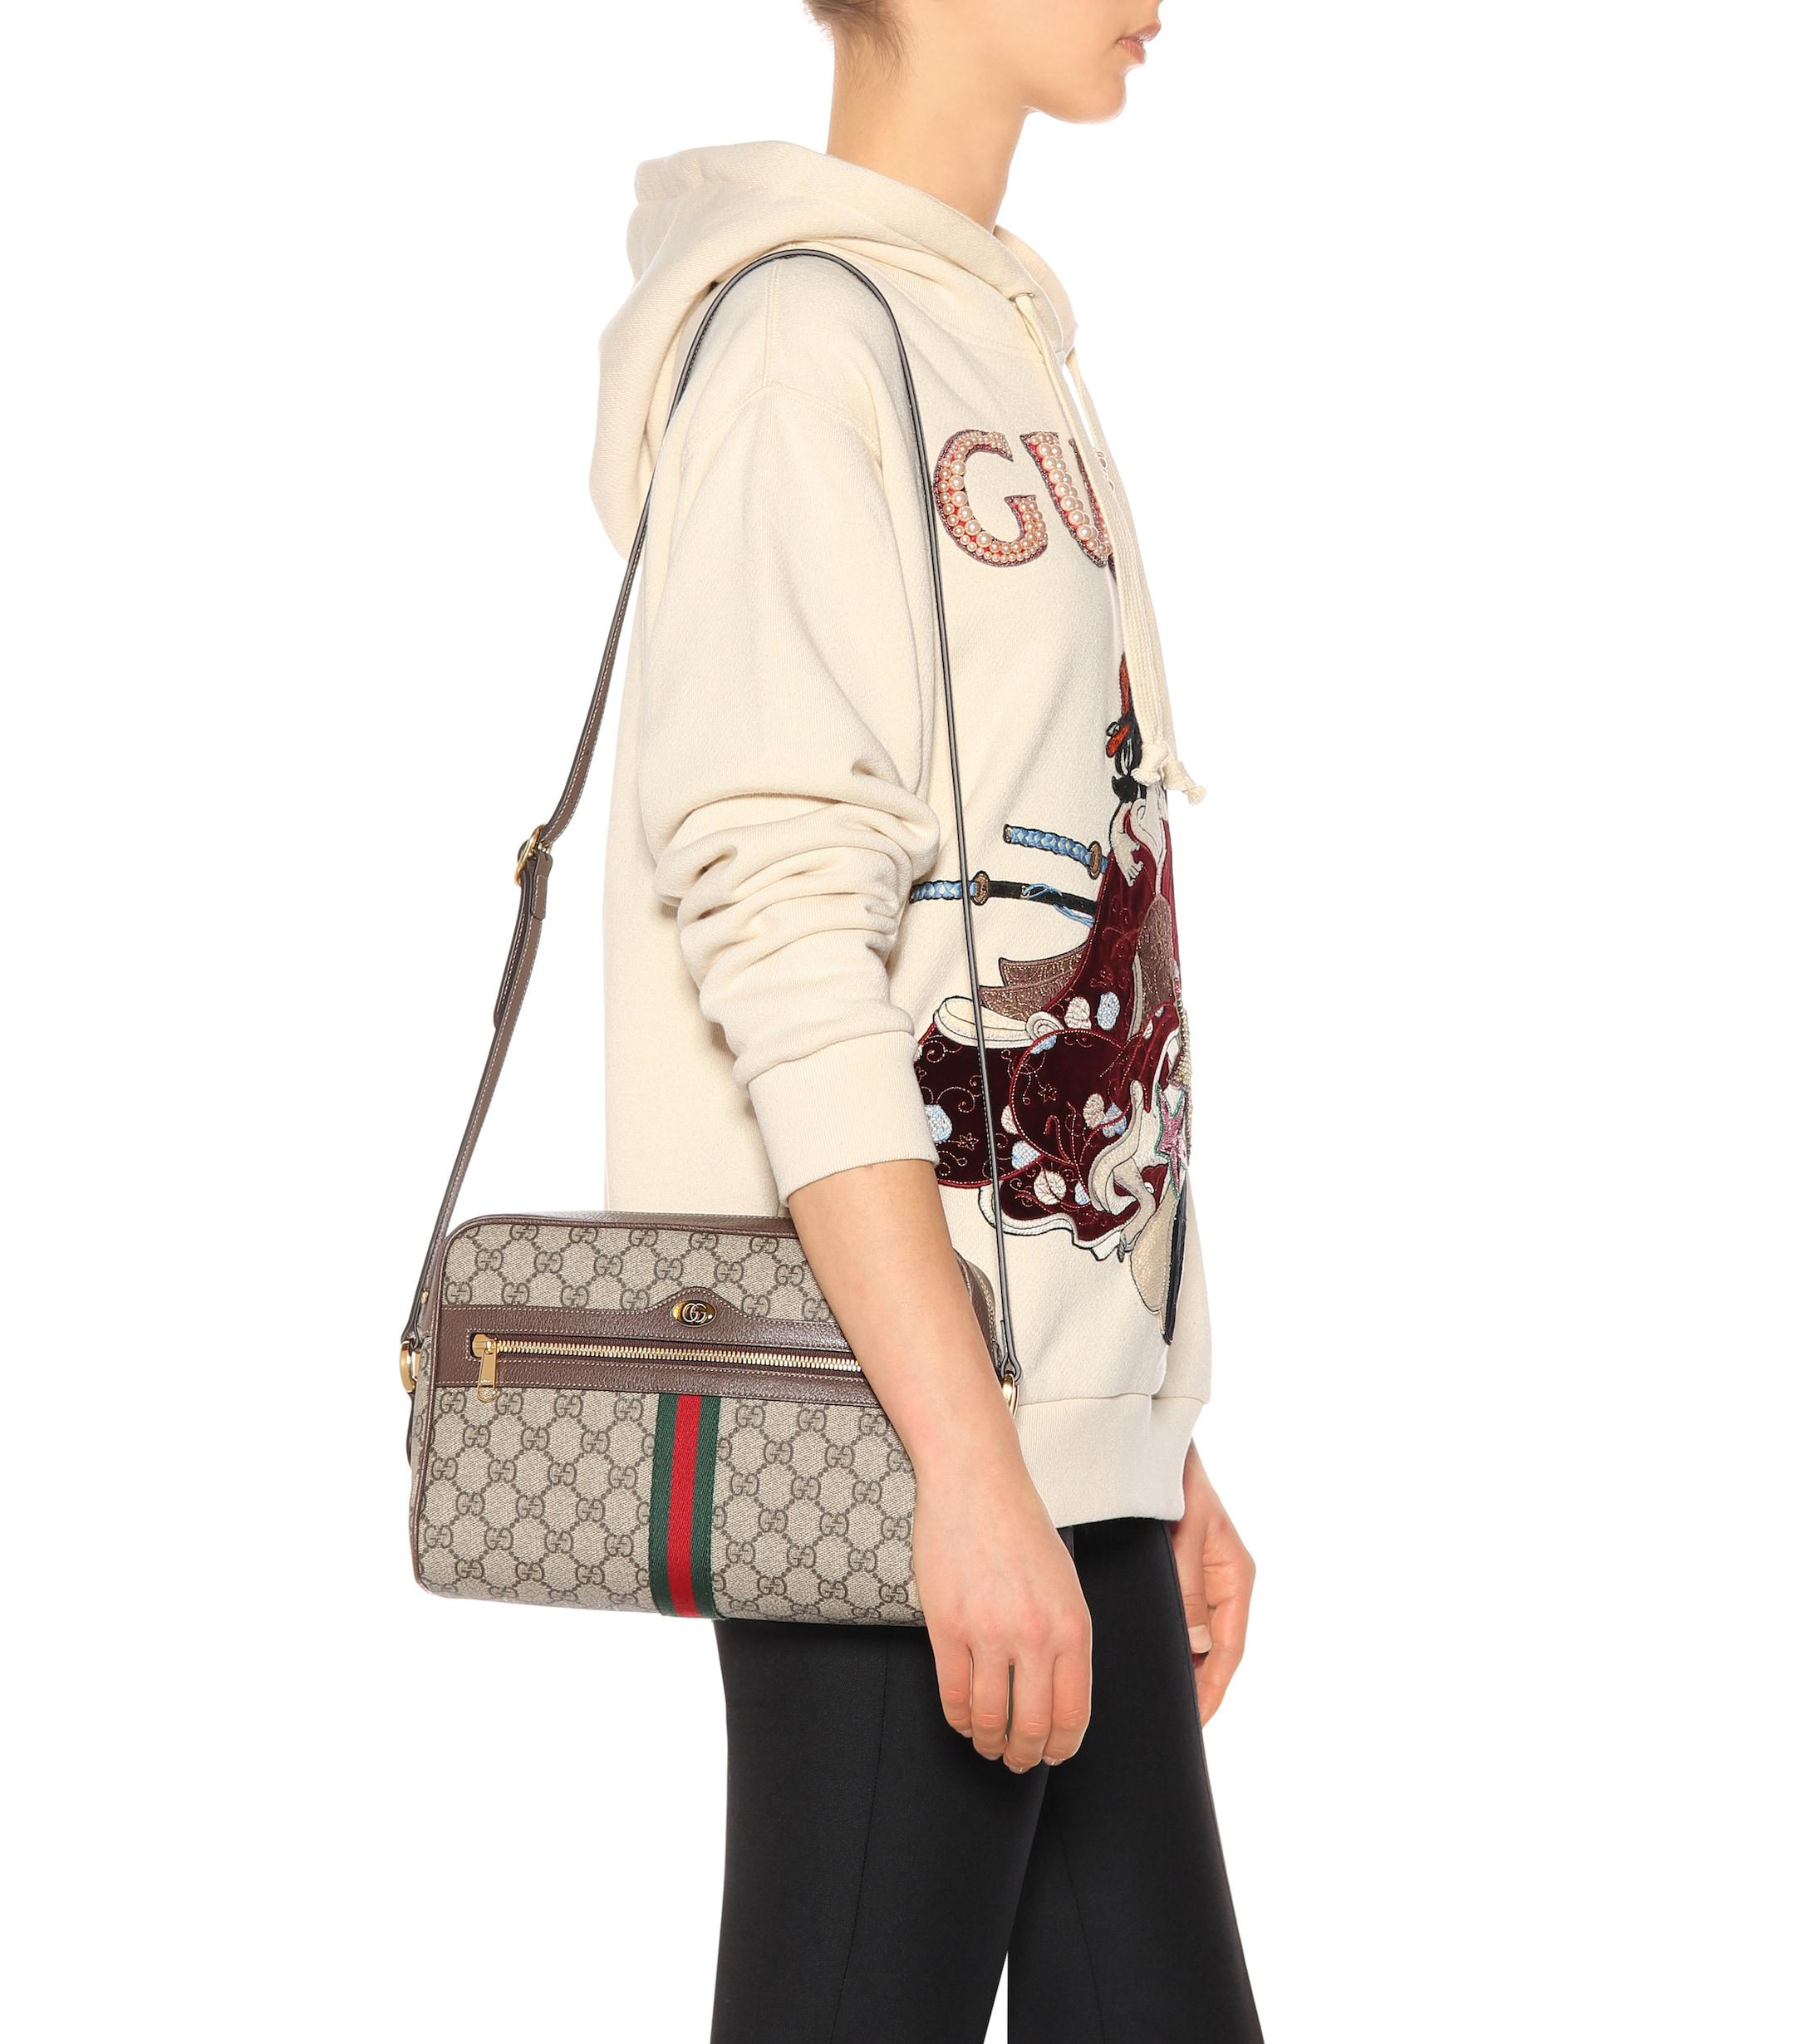 9bb63e53afa Gucci - Natural Ophidia Small GG Supreme Shoulder Bag - Lyst. View  fullscreen